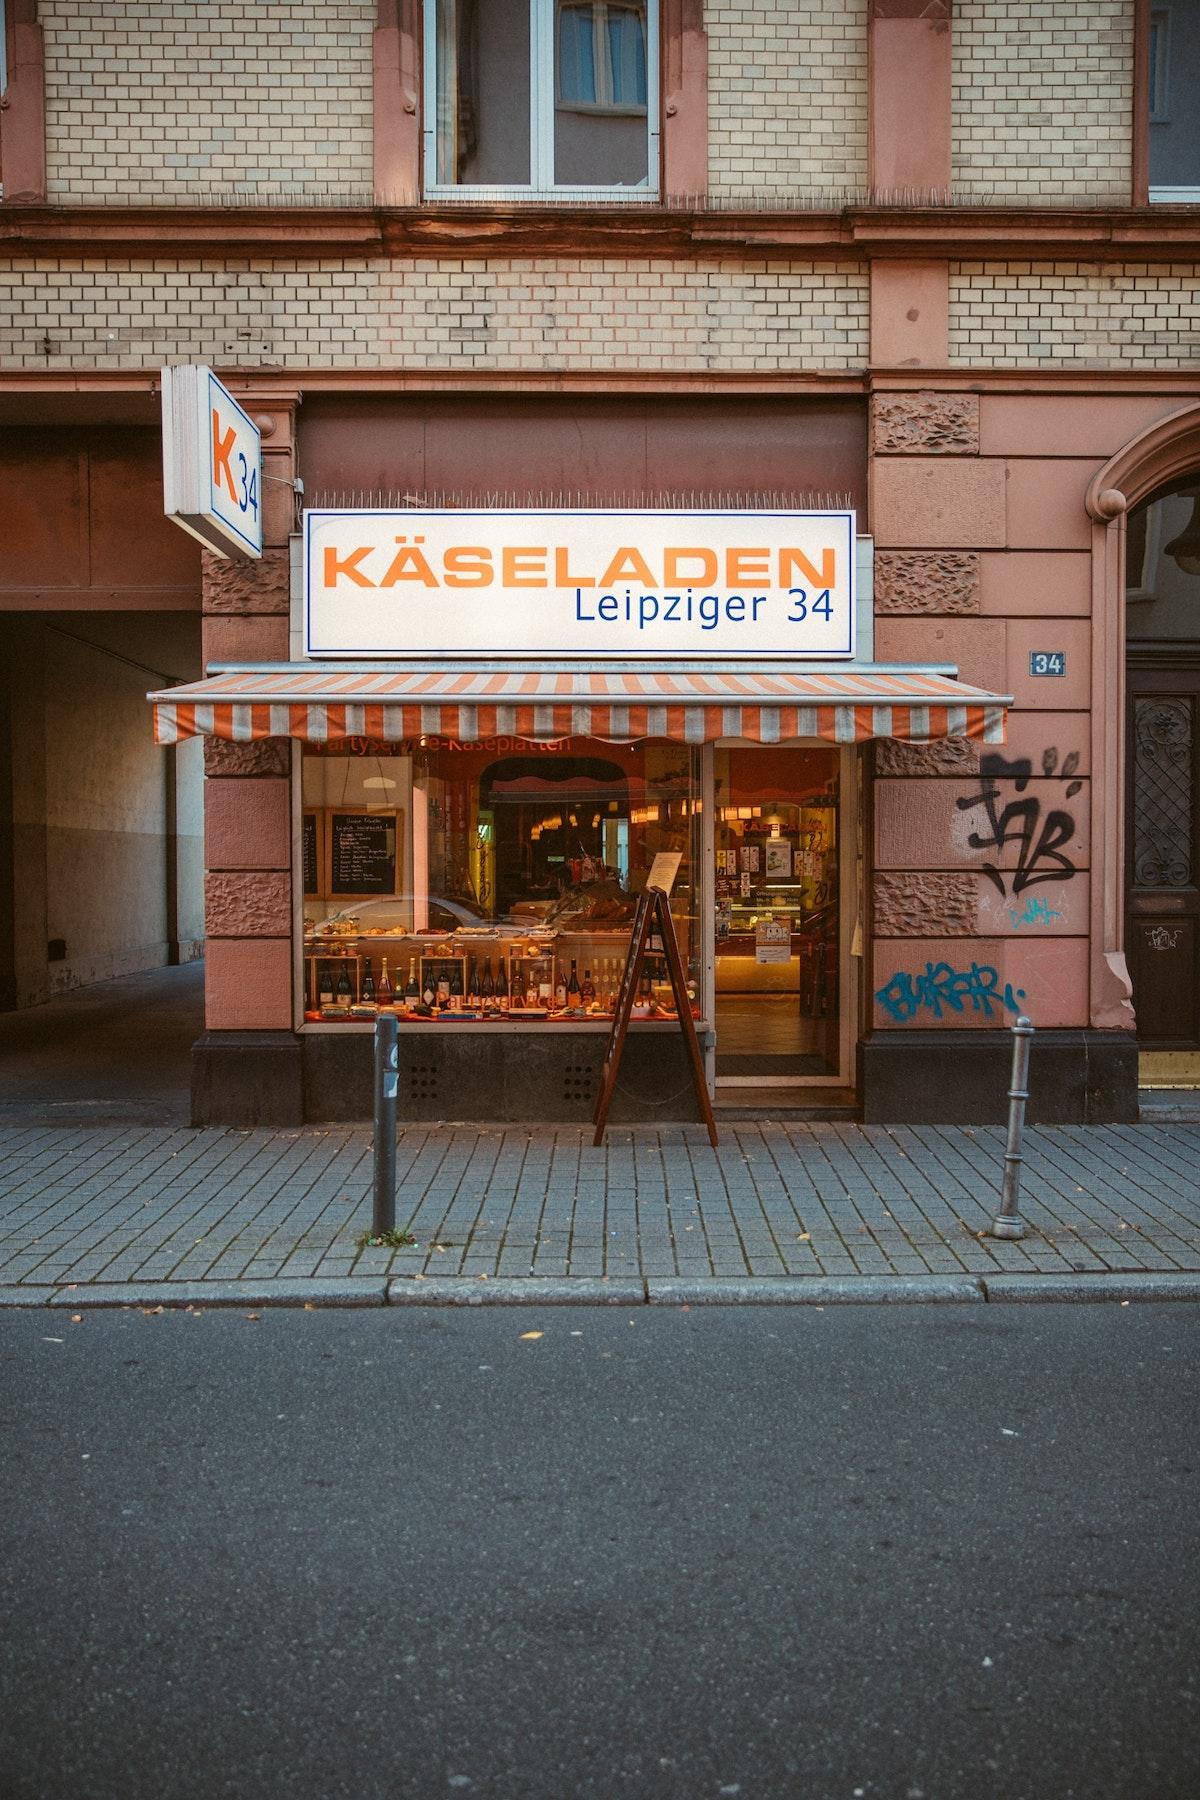 Käseladen Leipziger